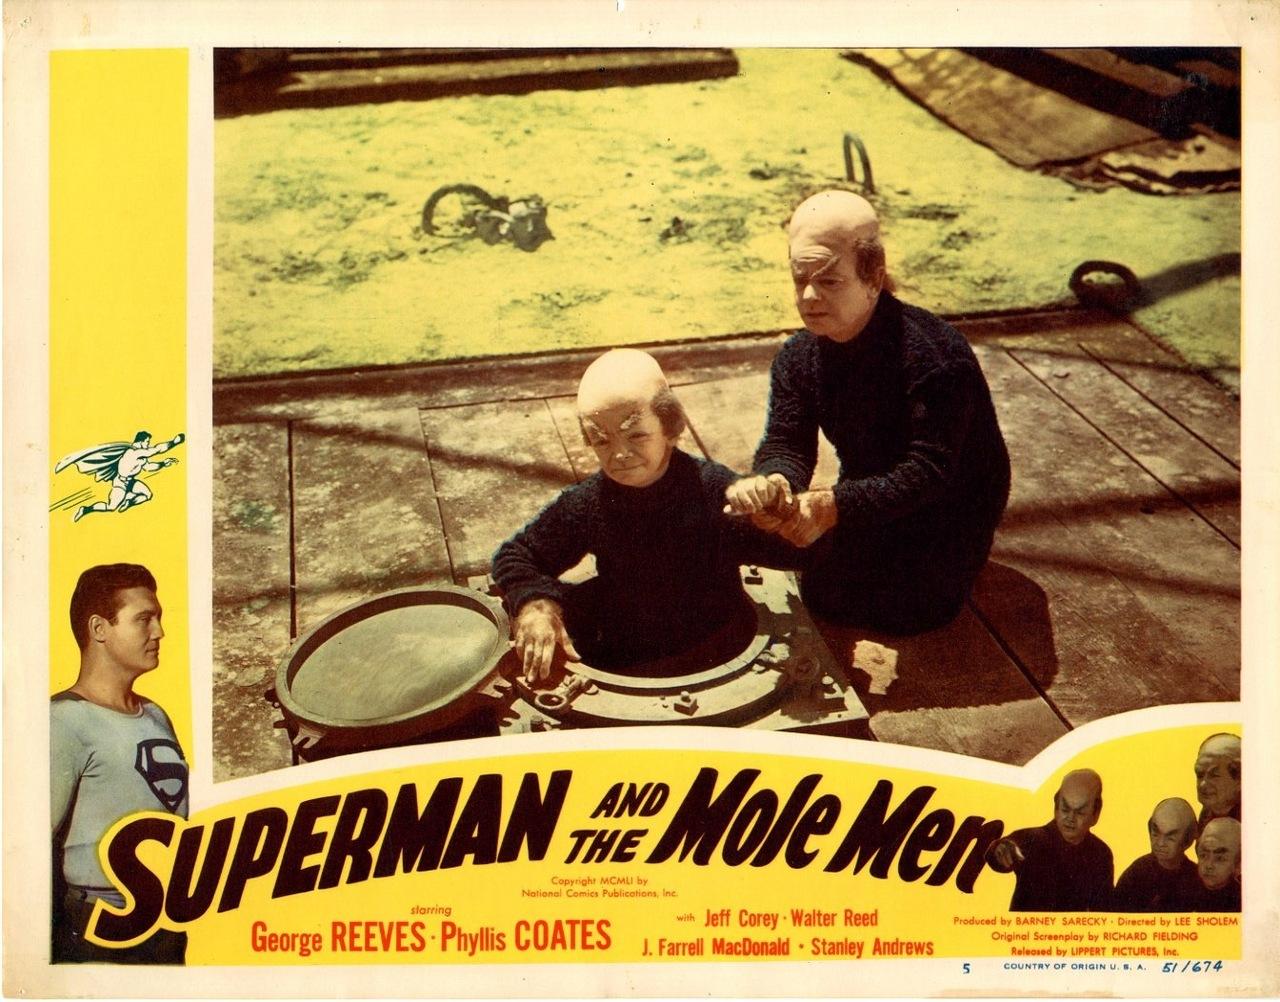 Suerman and the Mole Men lobby card